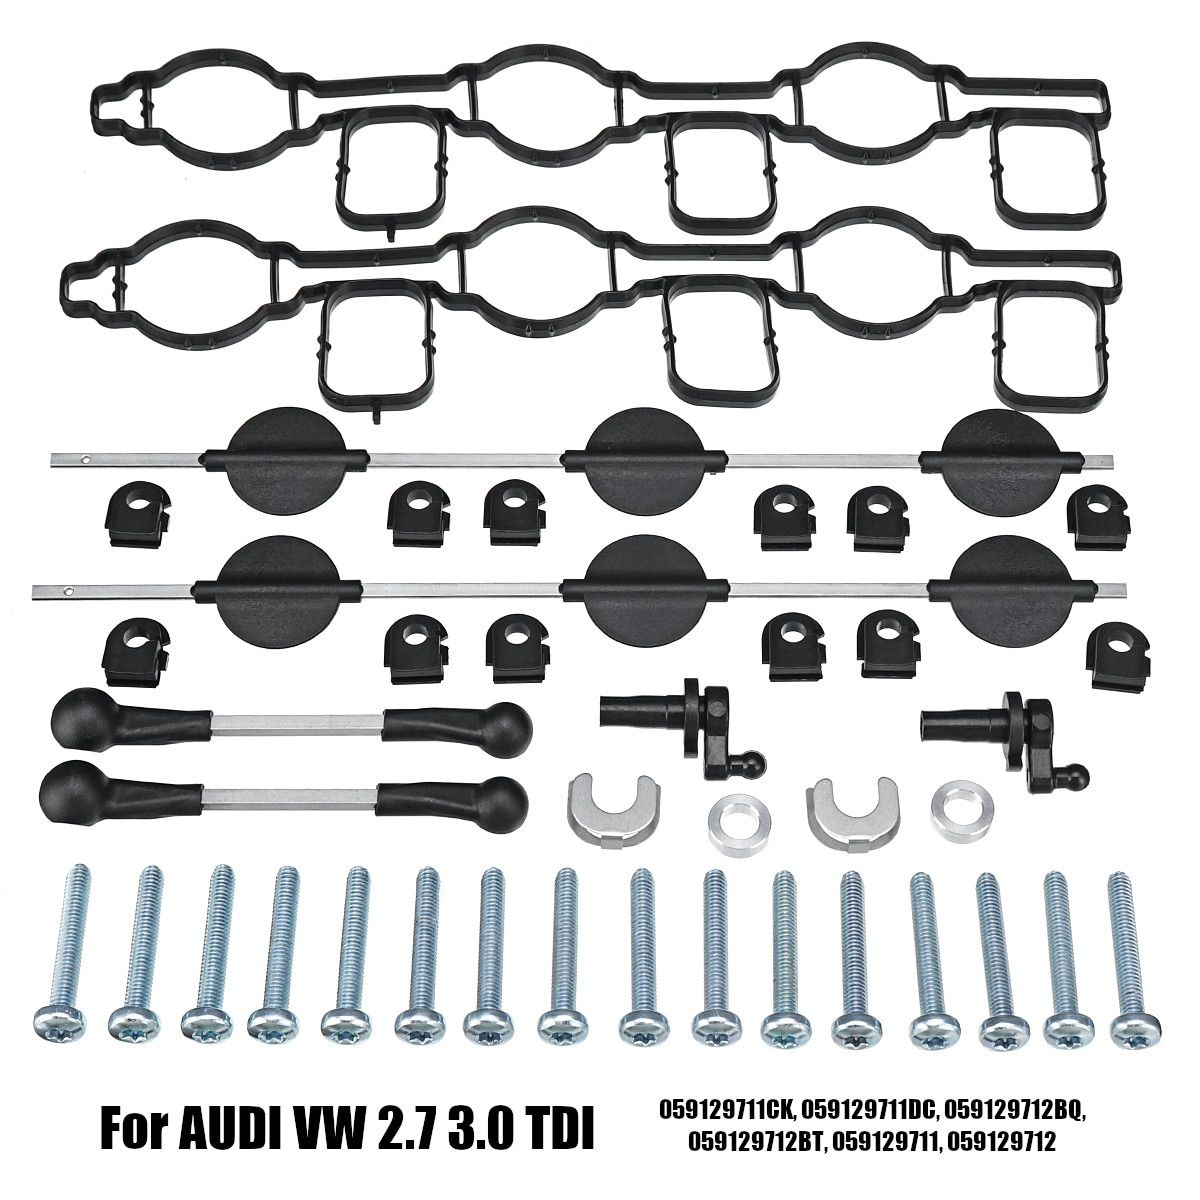 Einlass Saugrohr Swirl Klappen Set für AUDI für VW 2,7 TDI A4 A5 A6 A8 Touareg 059129711CK 059129711DC 059129712BQ 059129712B